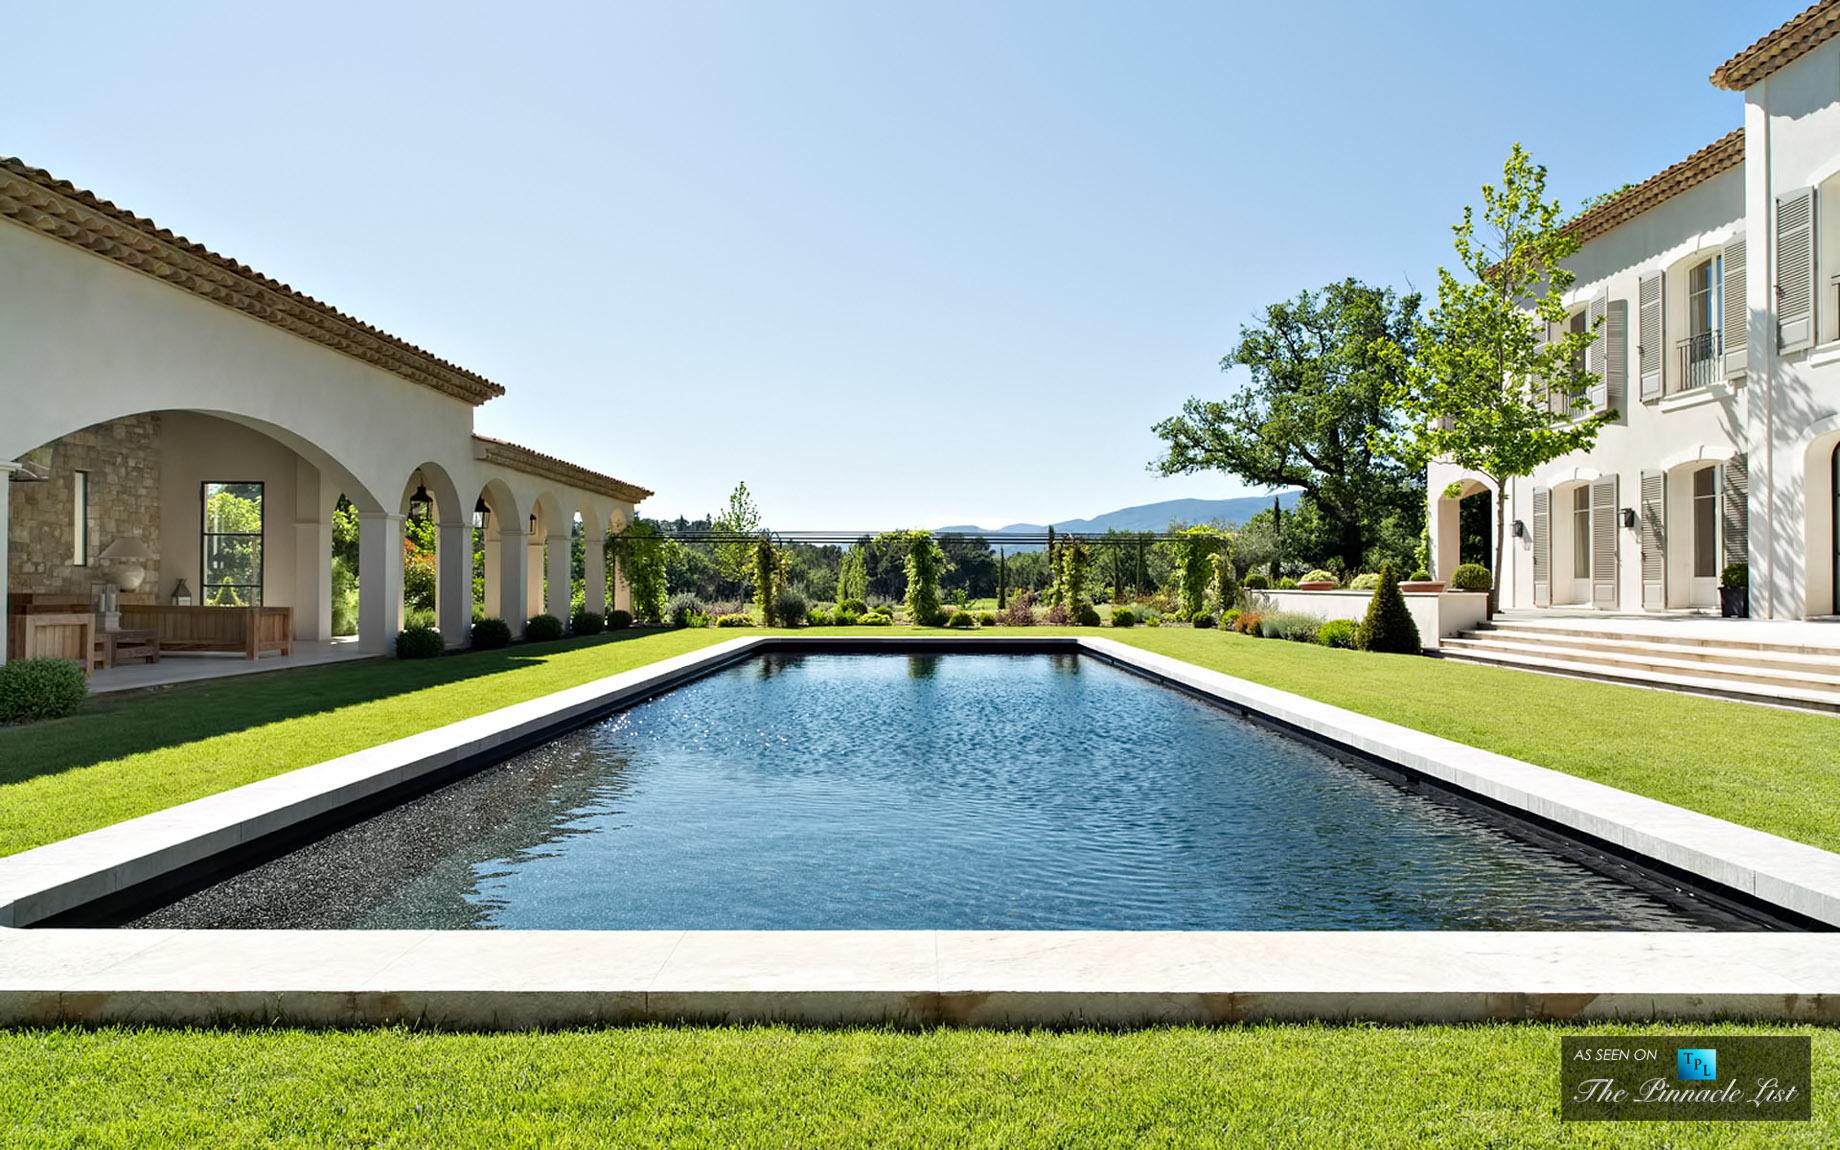 La Bergerie de Terre Blanche Villa - Provence, France - The 5 Best Rural Villas in the Mediterranean for Luxury Retreats